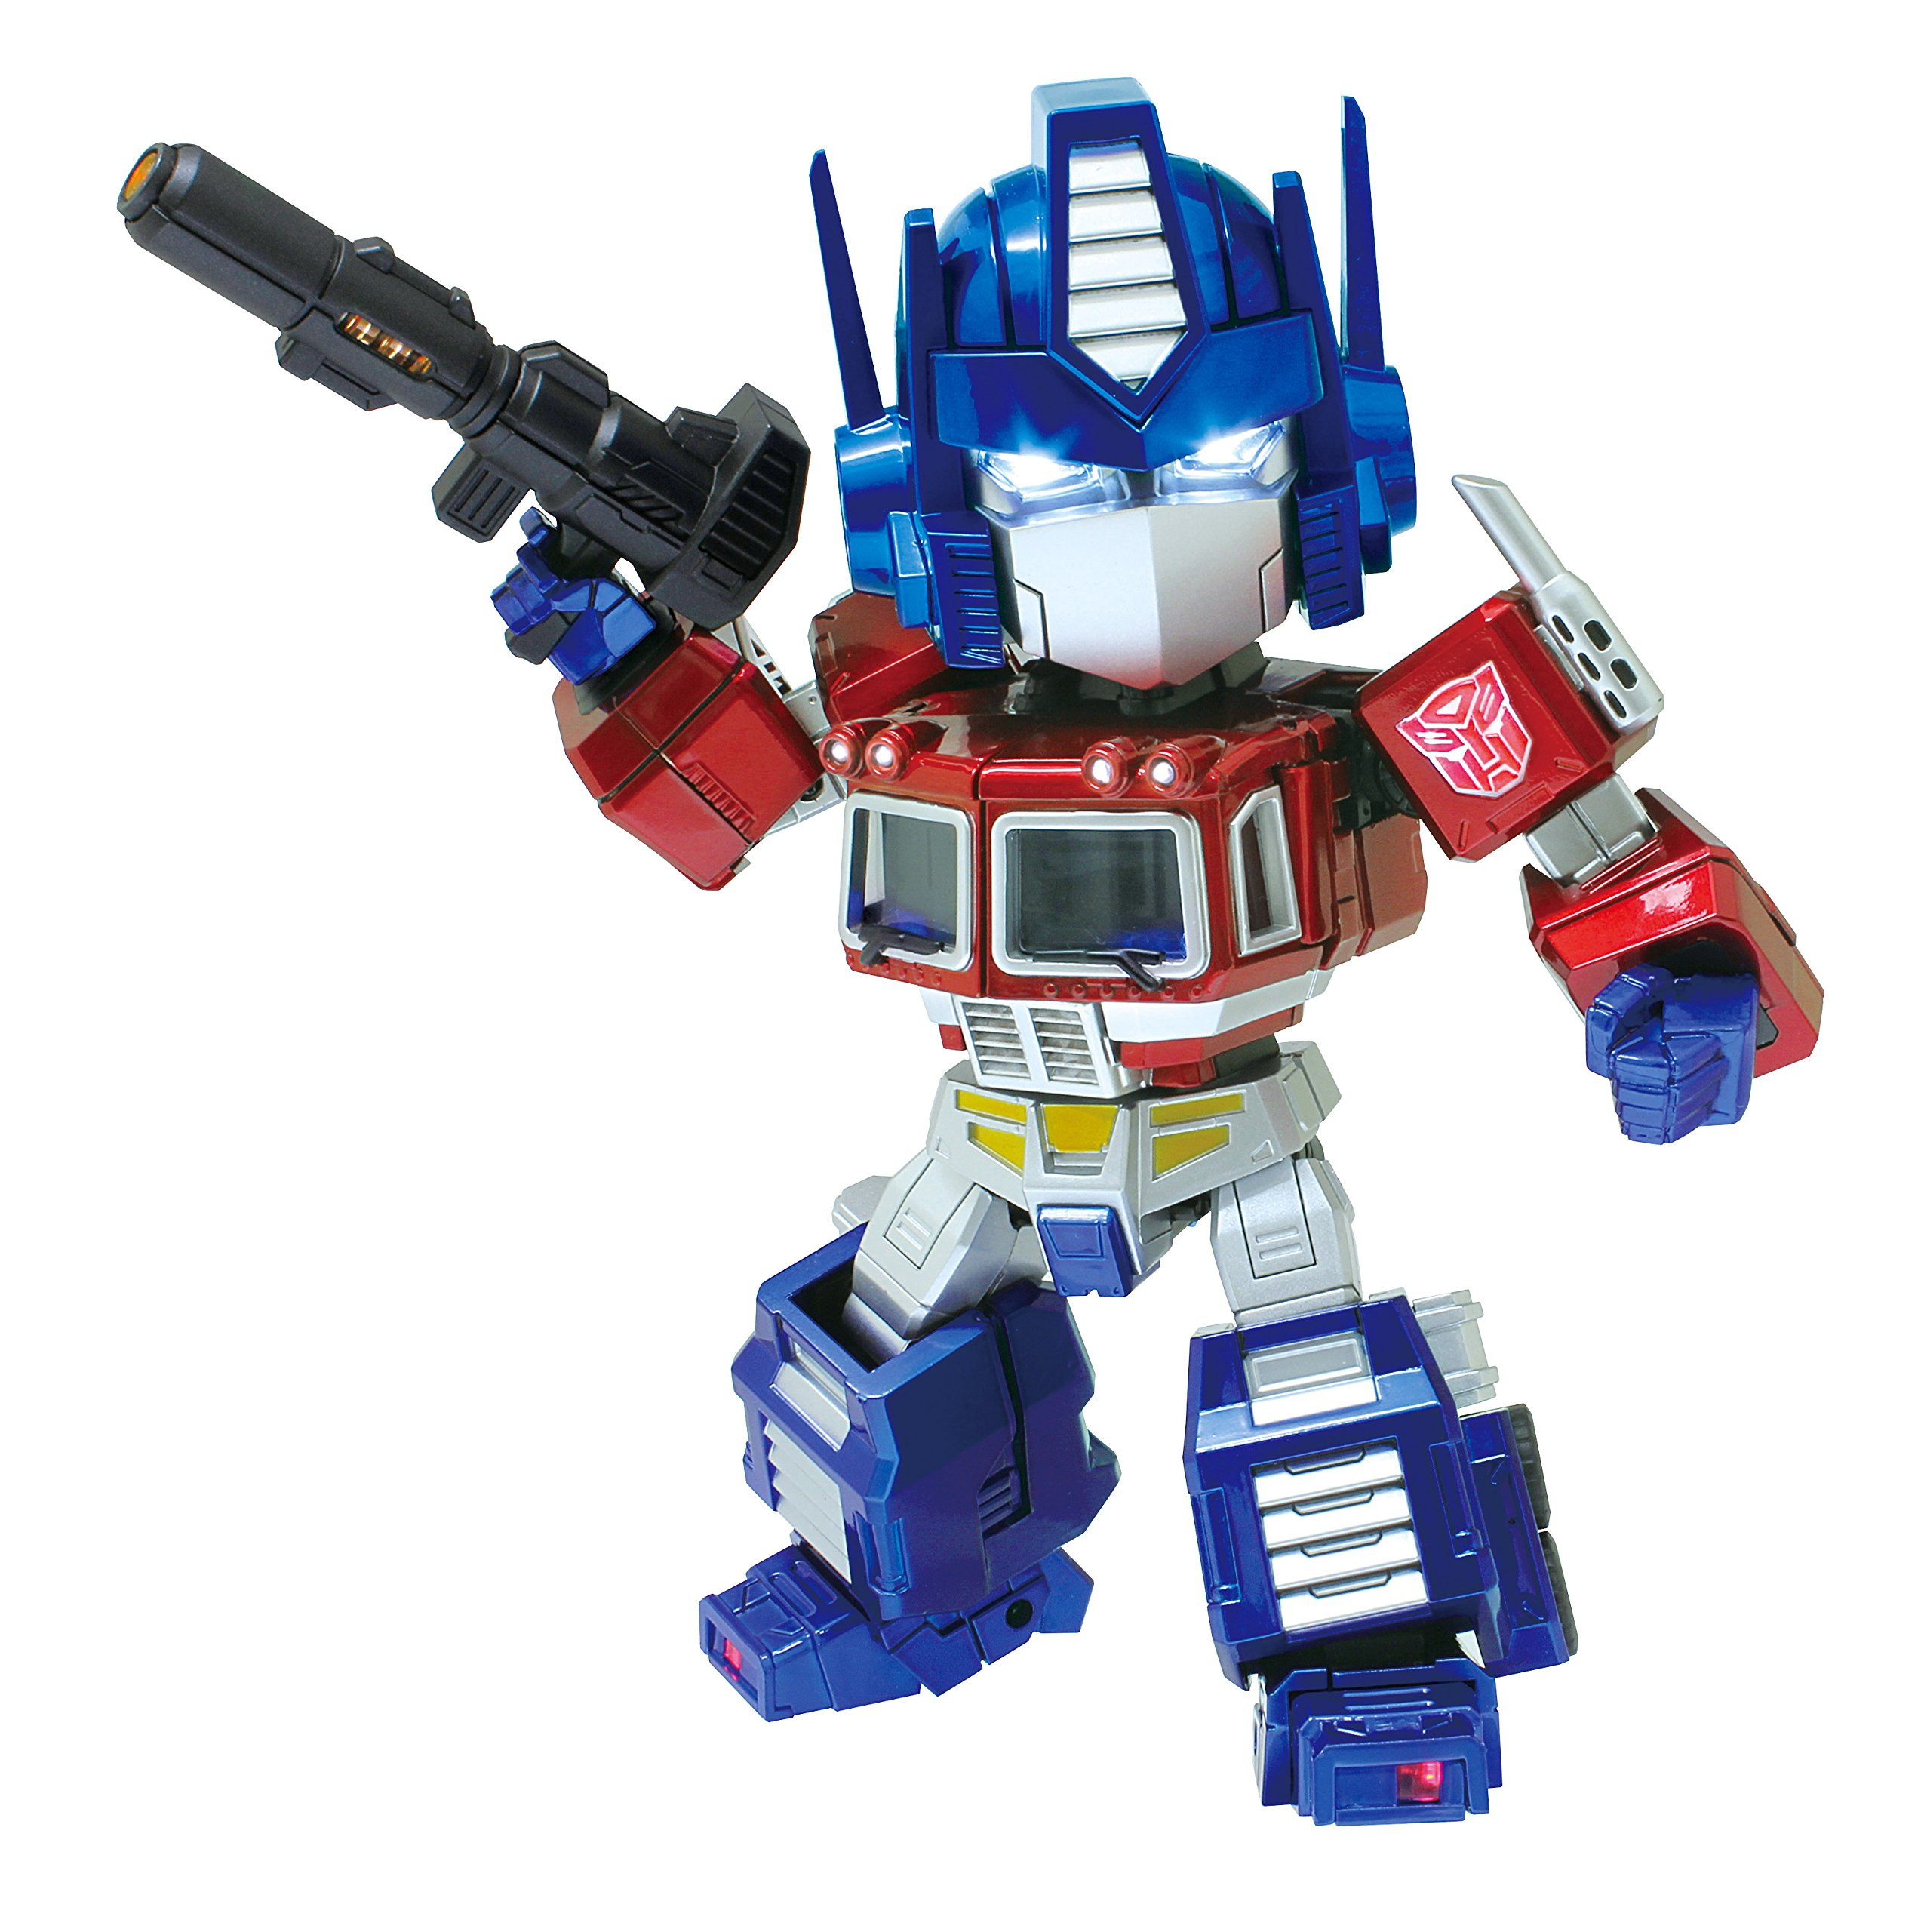 KIDS LOGIC DAF Transformers G1 Optimus Prime: 4897034453768